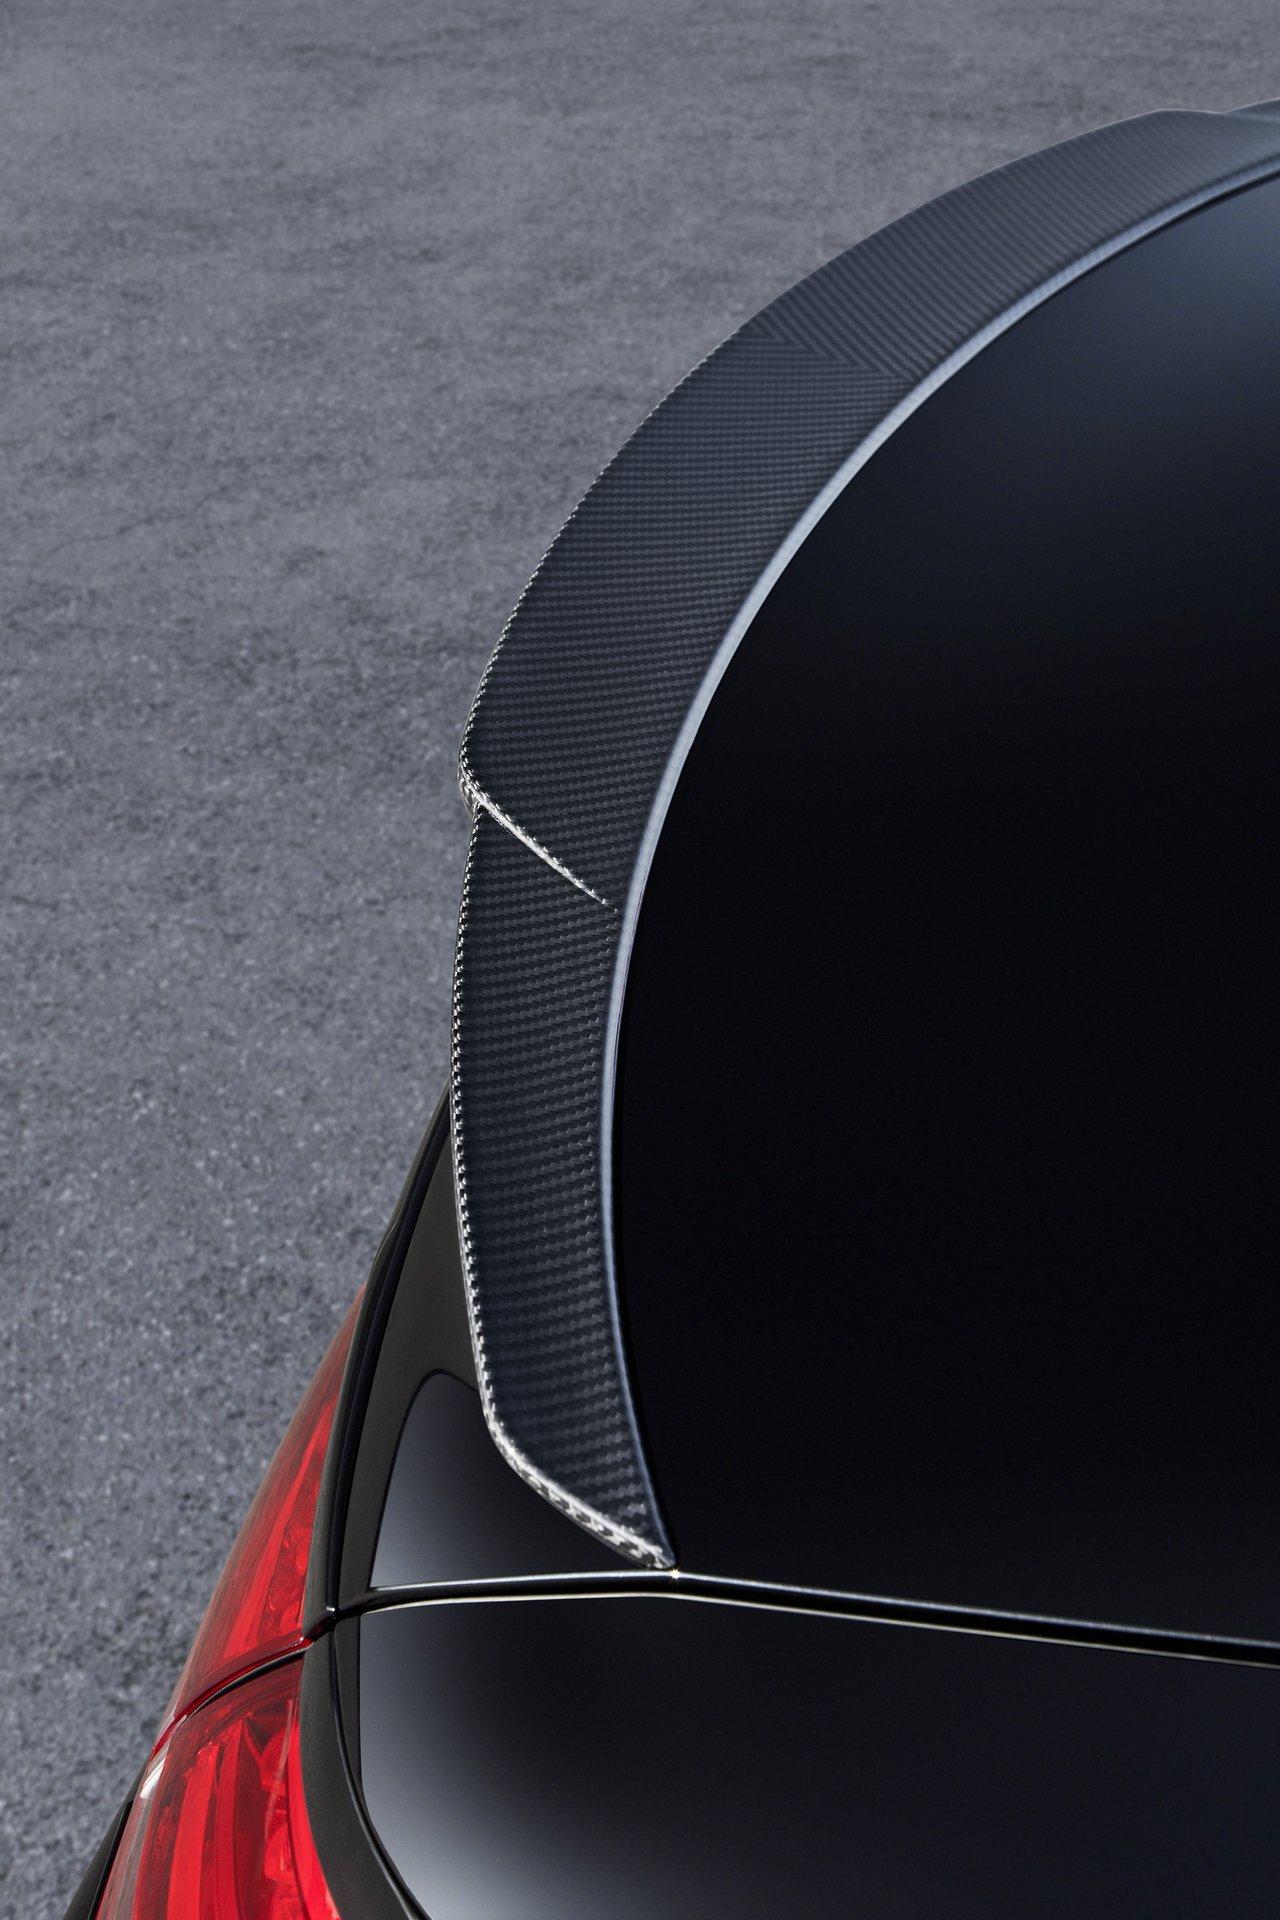 ginevra_2015-brabus-850-sc-e-mercedes-s63-amg-coupe-0-100_18